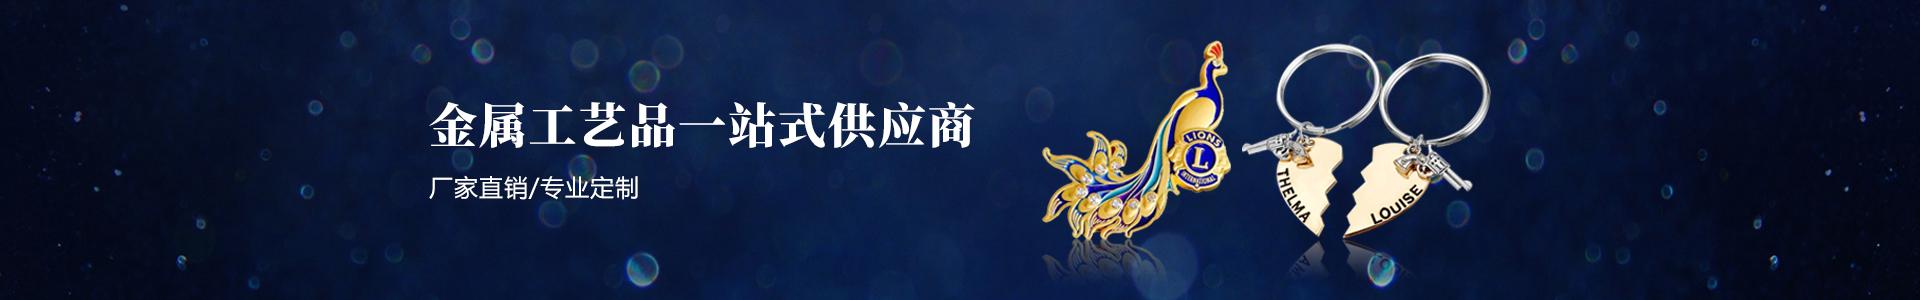 http://www.xingjintai.com/data/upload/202008/20200817182622_688.jpg